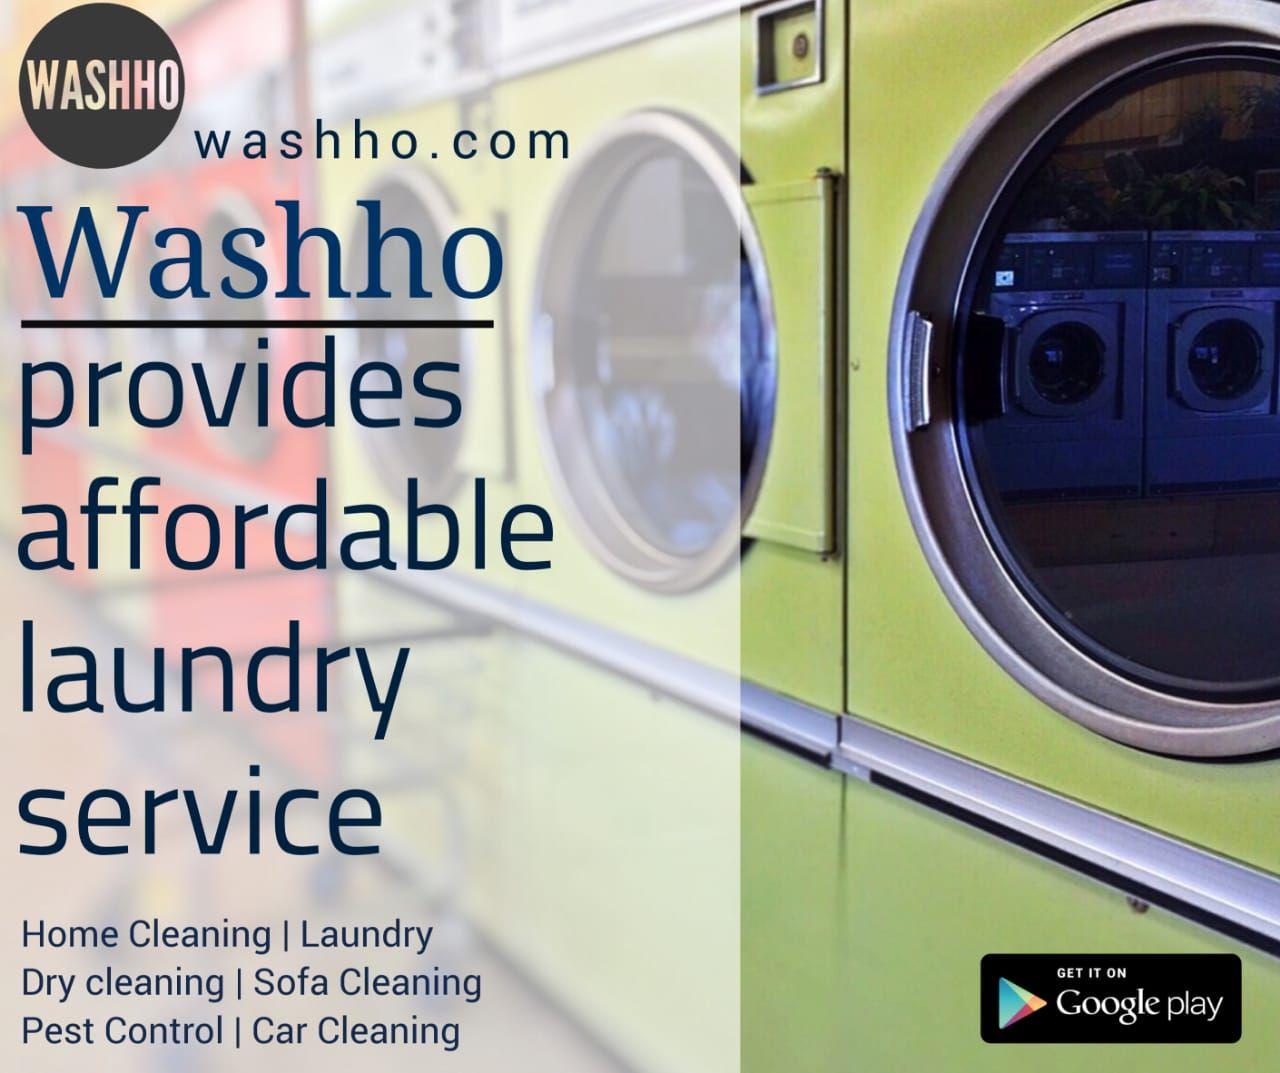 Http Washho Com Laundry Service Html Washho Laundry Services